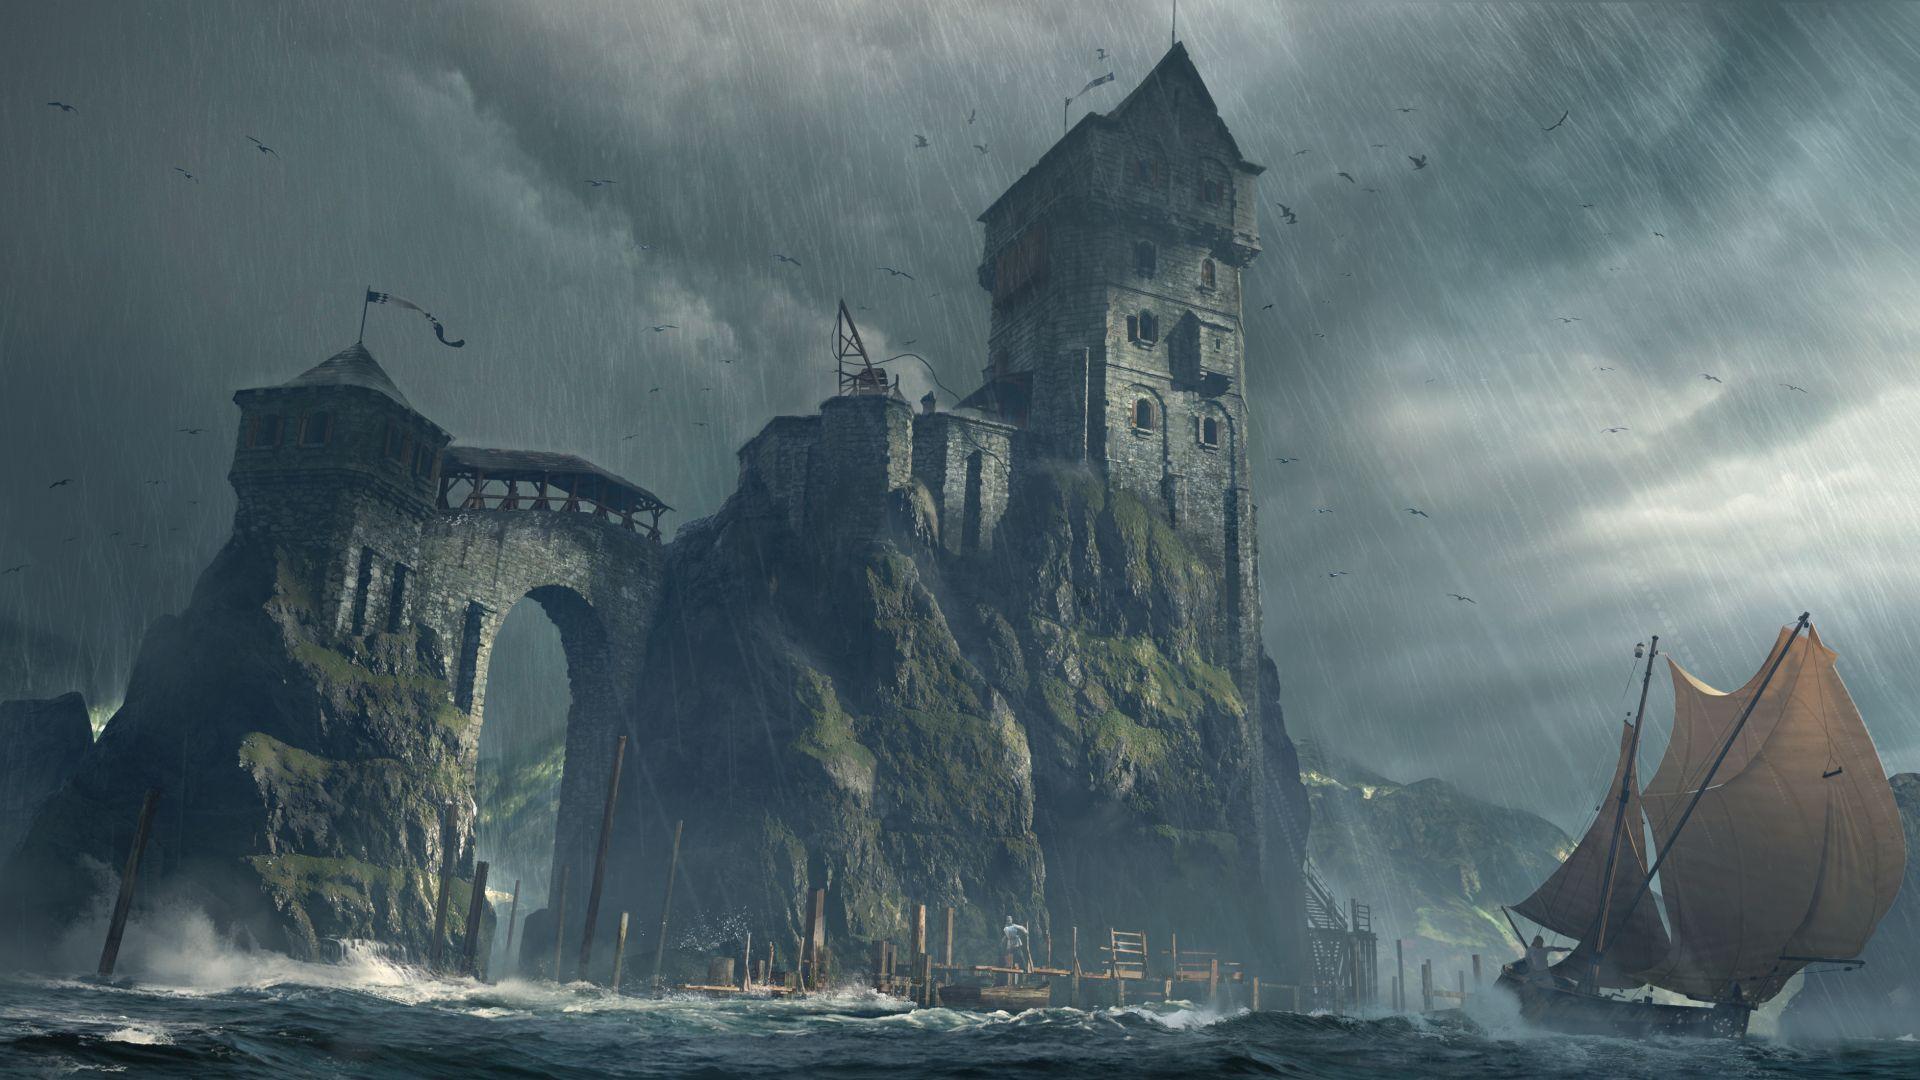 Fantasy Castle 4k Fortress Boat Art Wallpaper